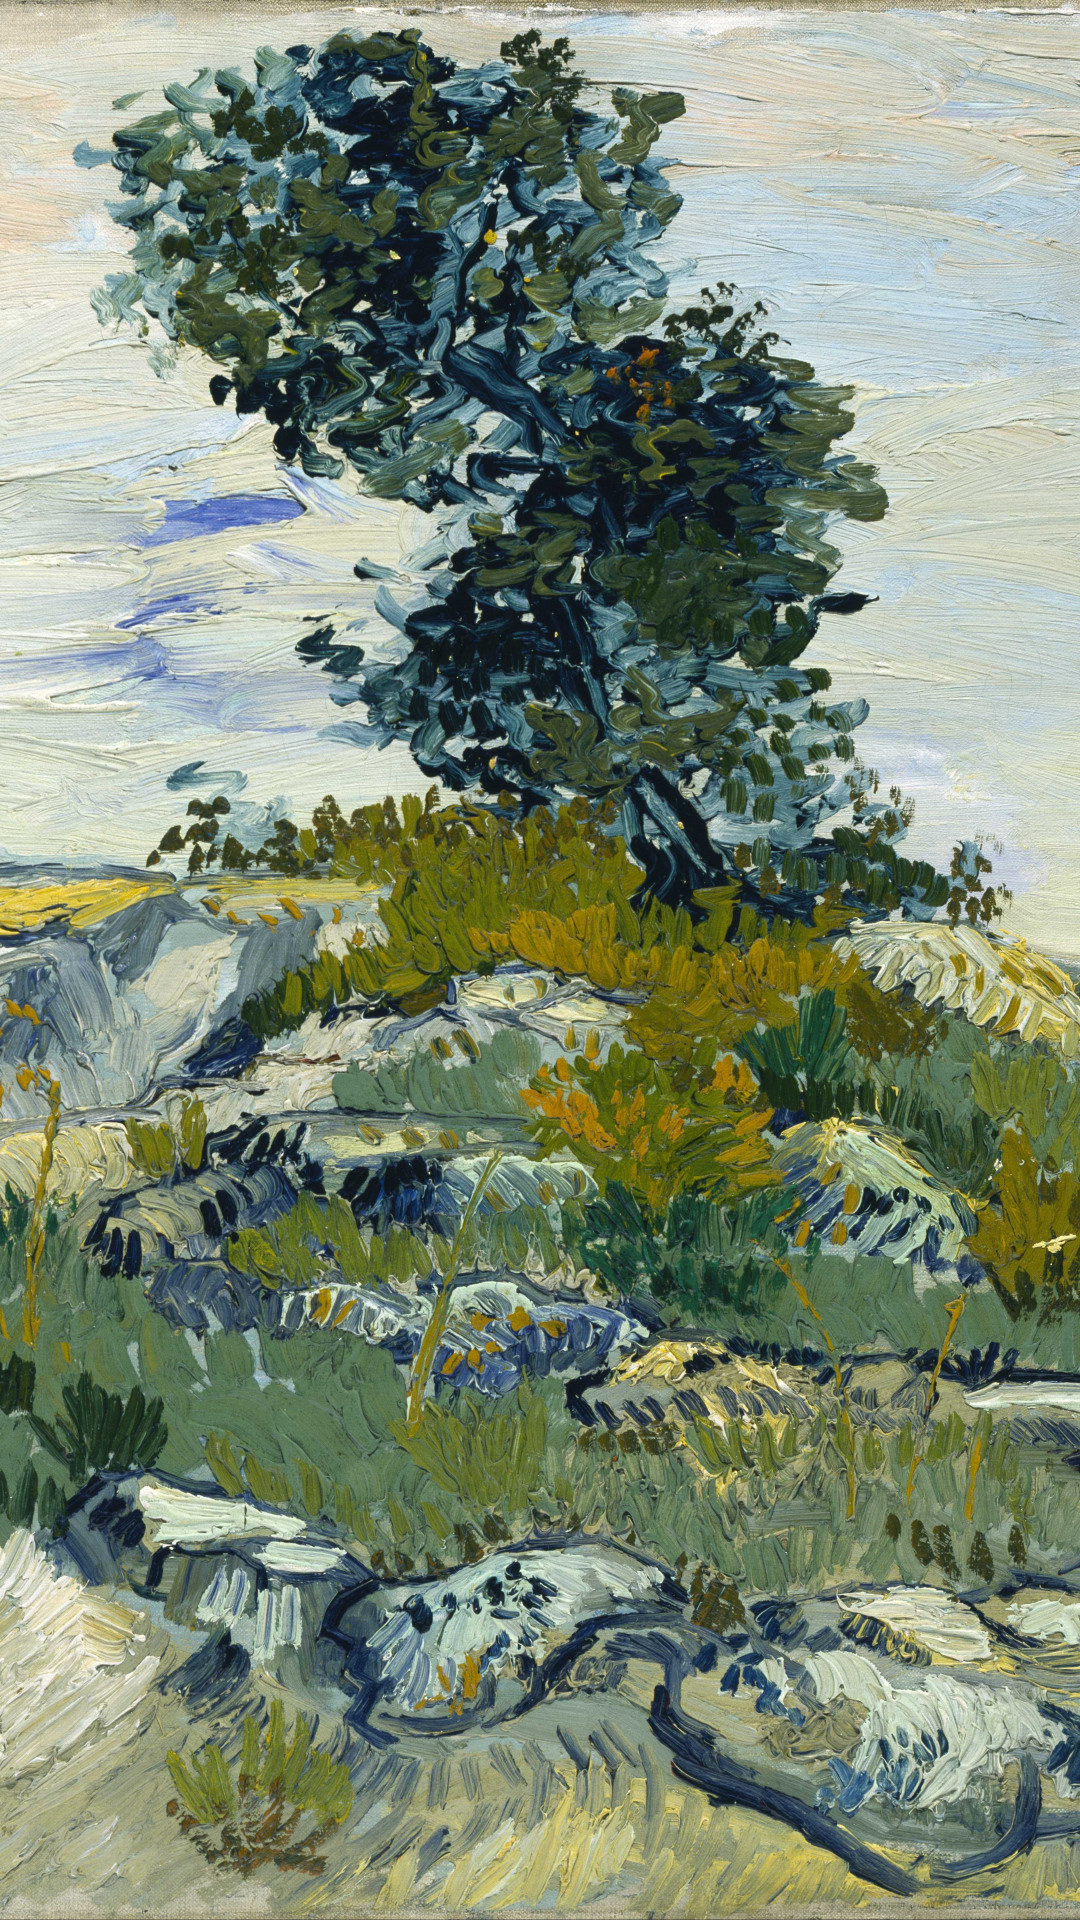 Van Gogh Desktop Wallpaper 51 Images